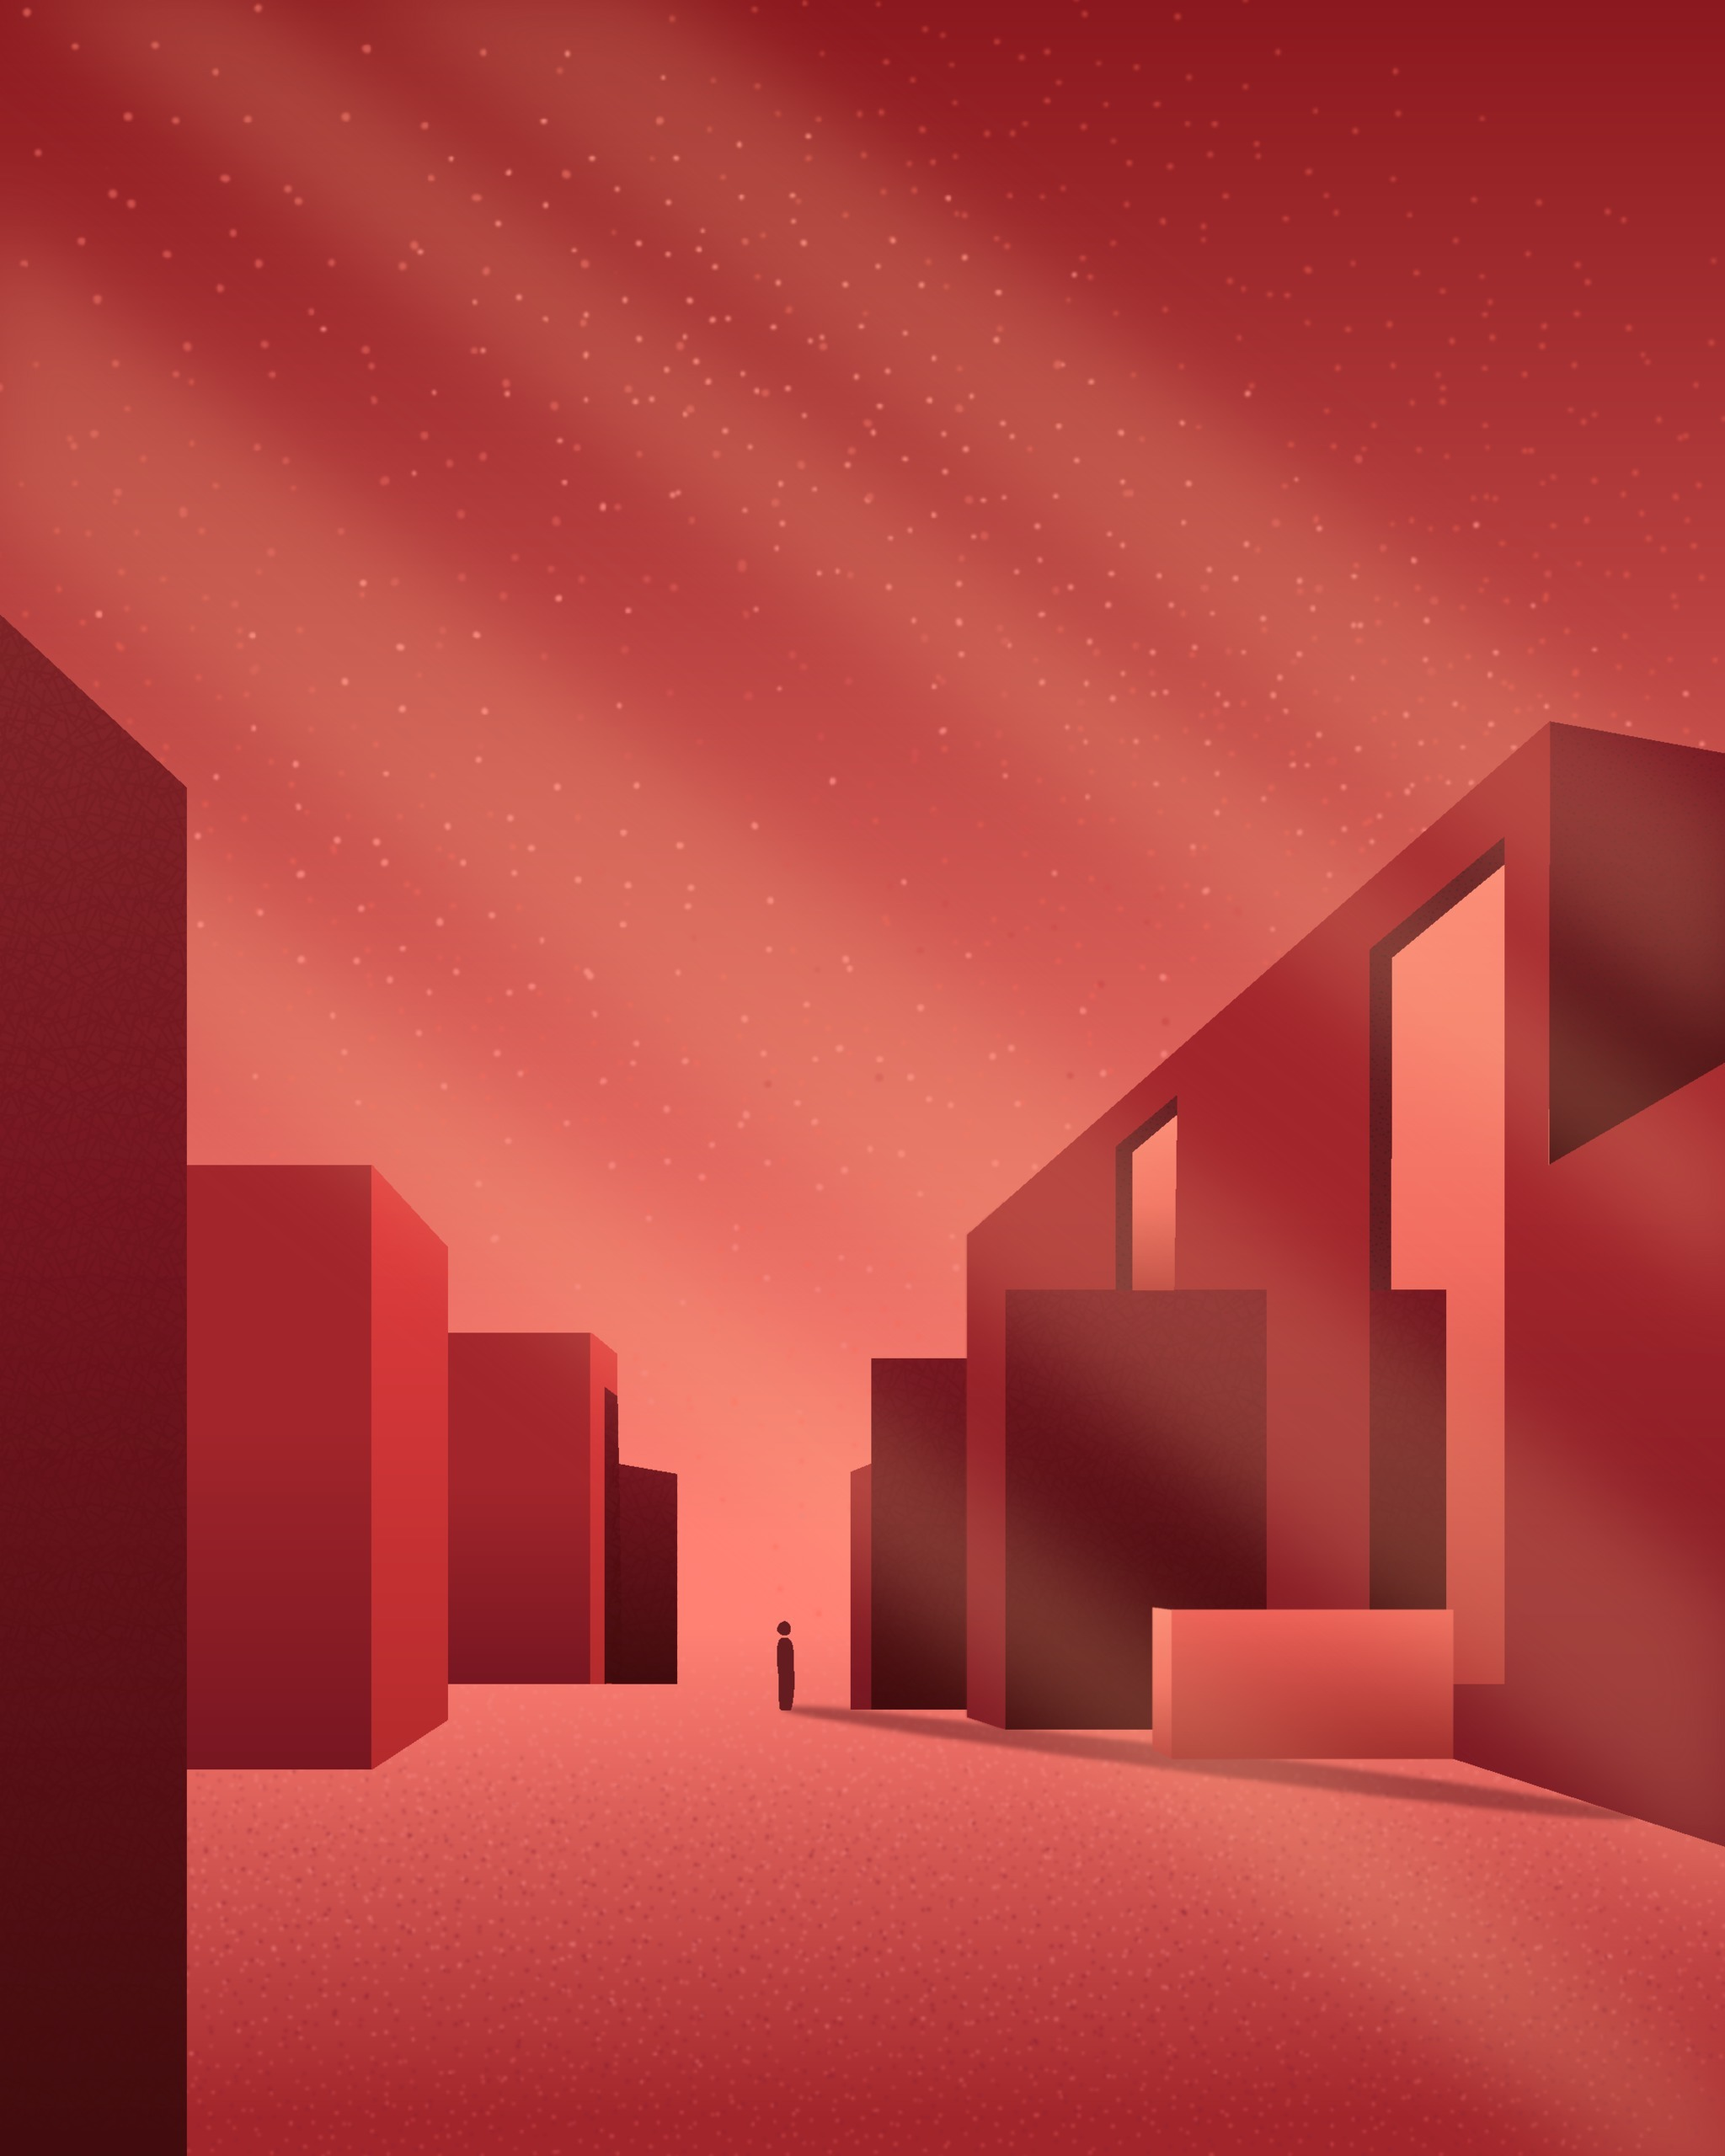 abstract gallery - illustration - gunimation | ello